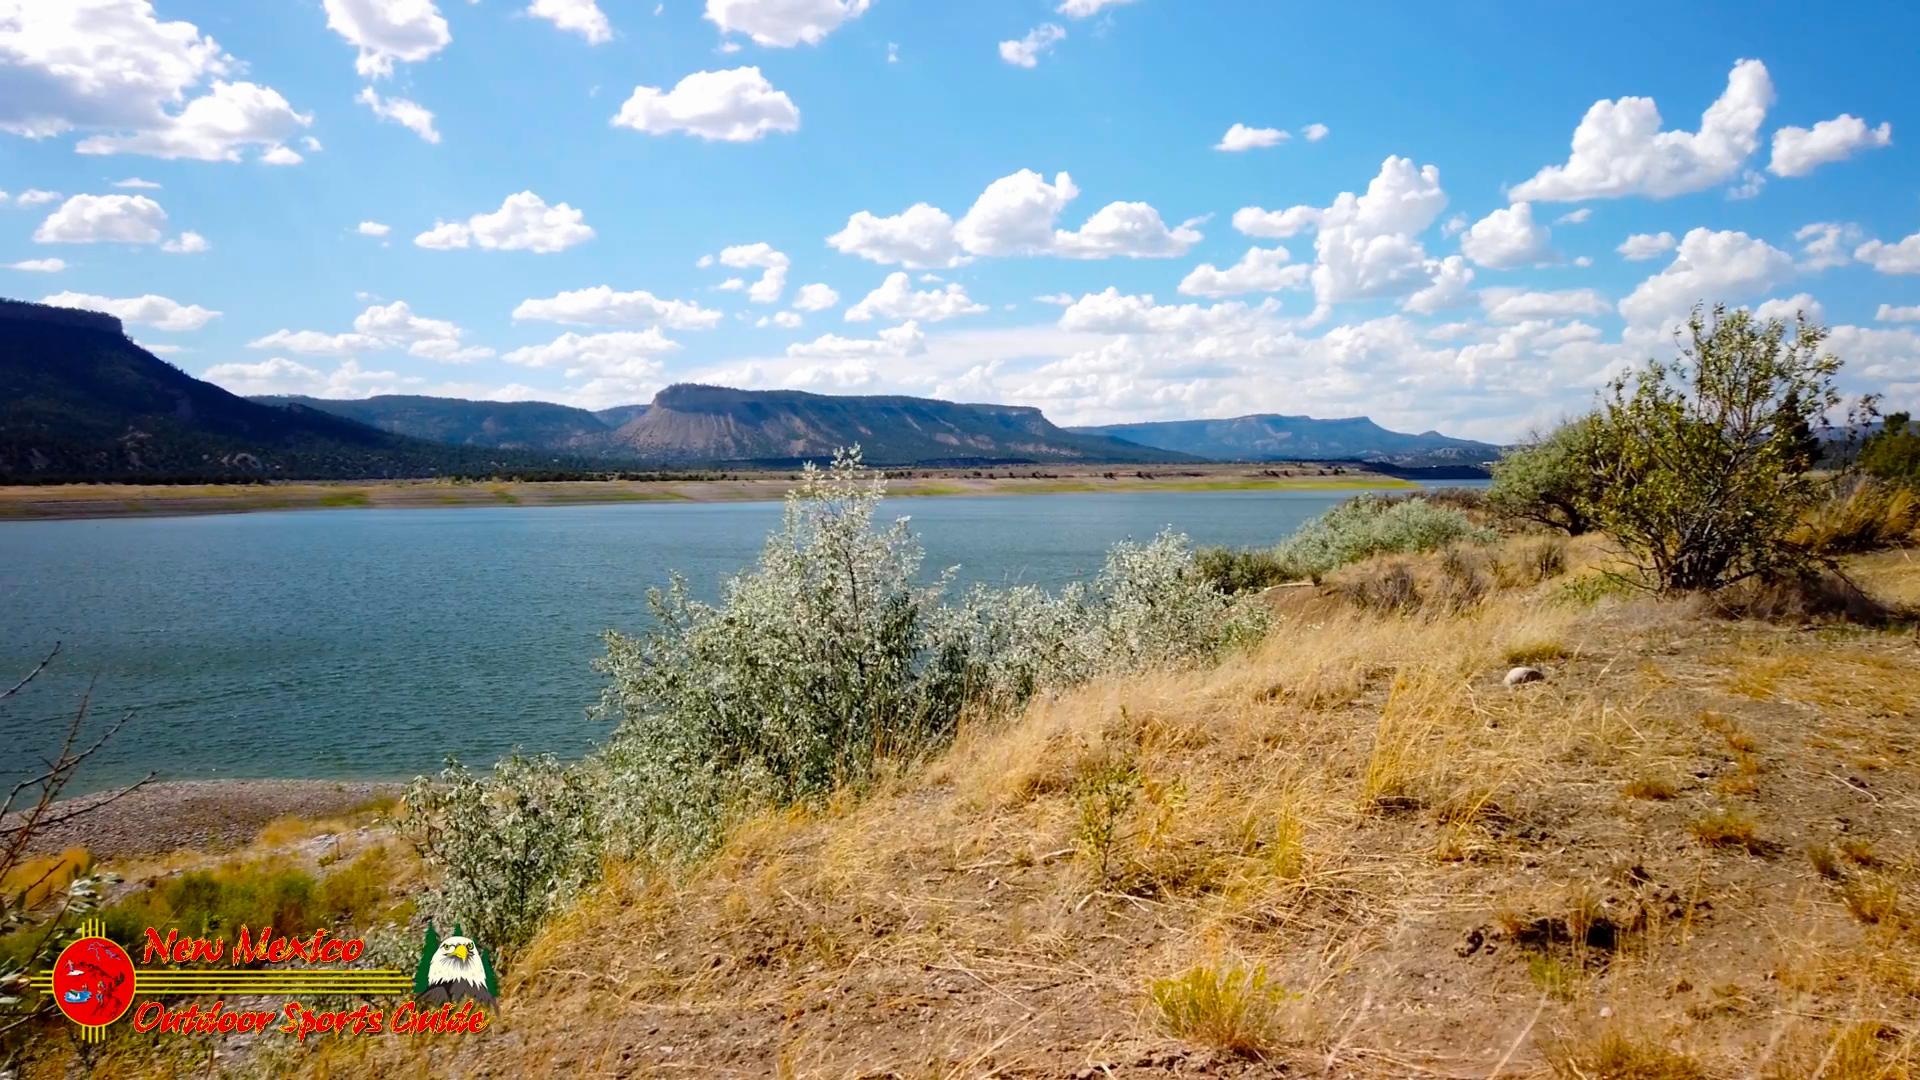 El-Vado-Lake-State-Park-Osmo-Pocket-07-14-2020